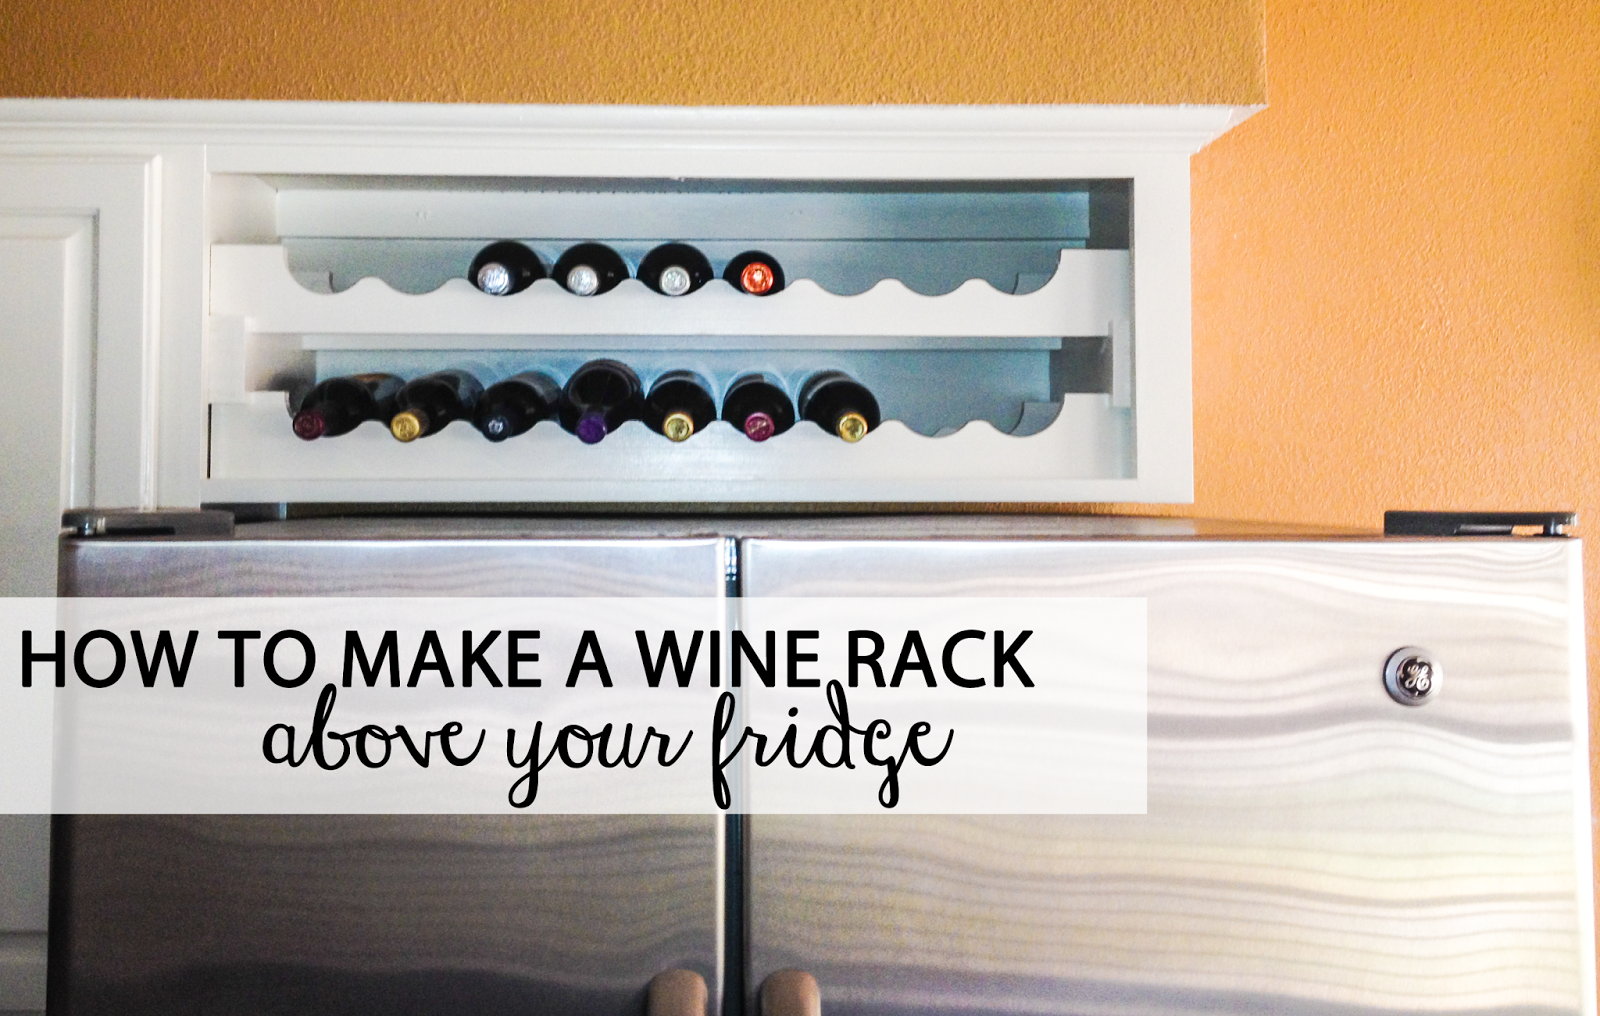 Sokolewicz Family How To Make A Wine Rack Above The Fridge Wine Rack Wine Rack Storage Wine Cabinet Diy